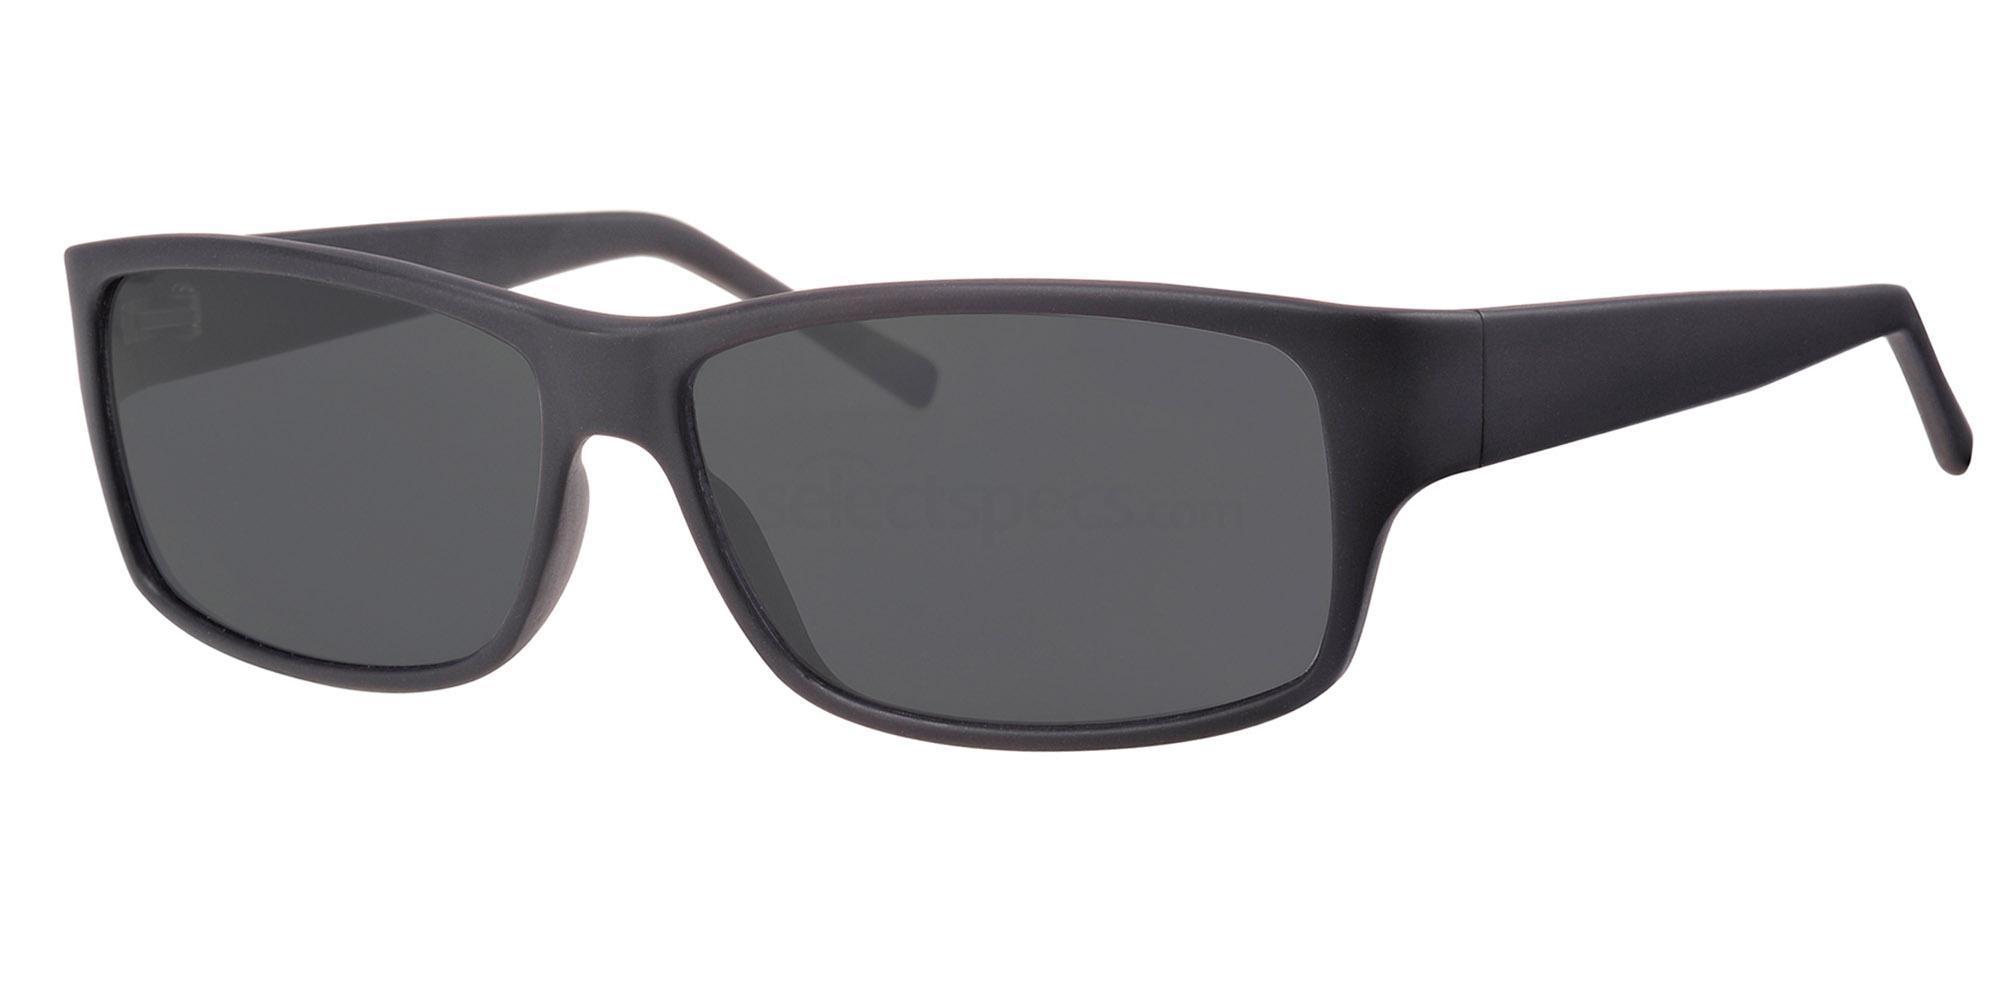 C01 VS190 Sunglasses, Visage